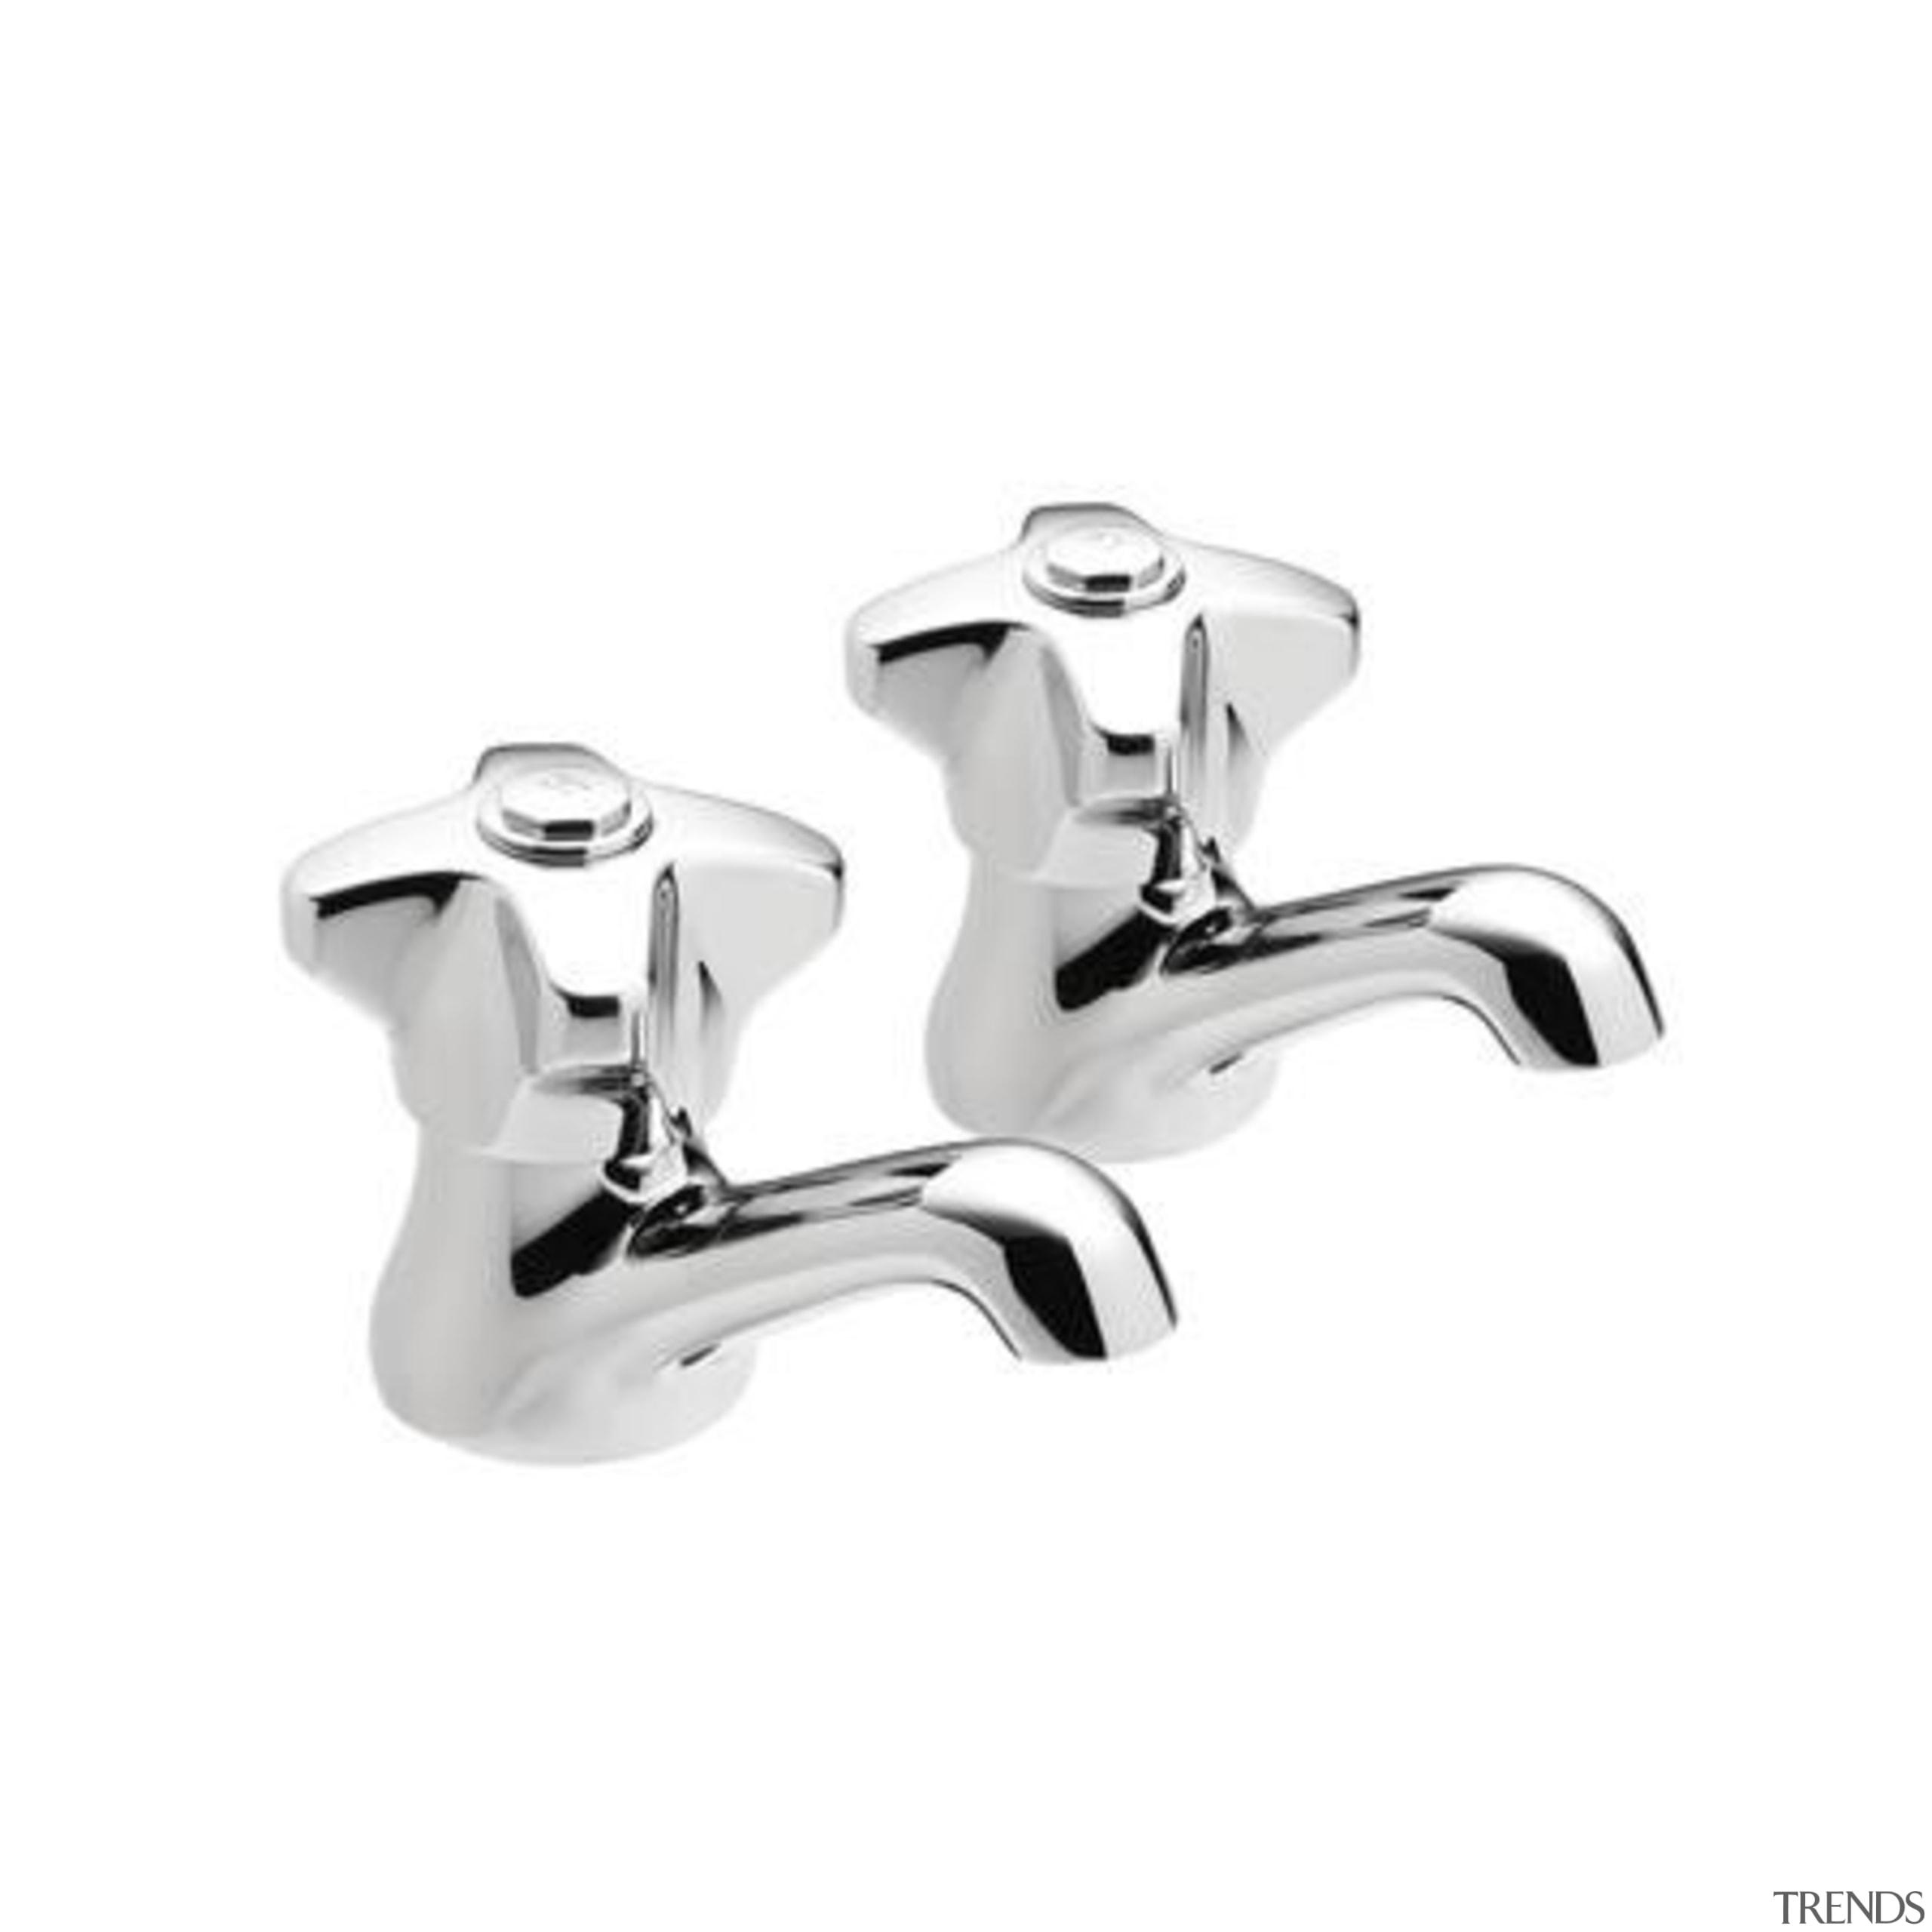 Timeless, yet modern – the Felton Indi range body jewelry, hardware, plumbing fixture, product, product design, silver, tap, white